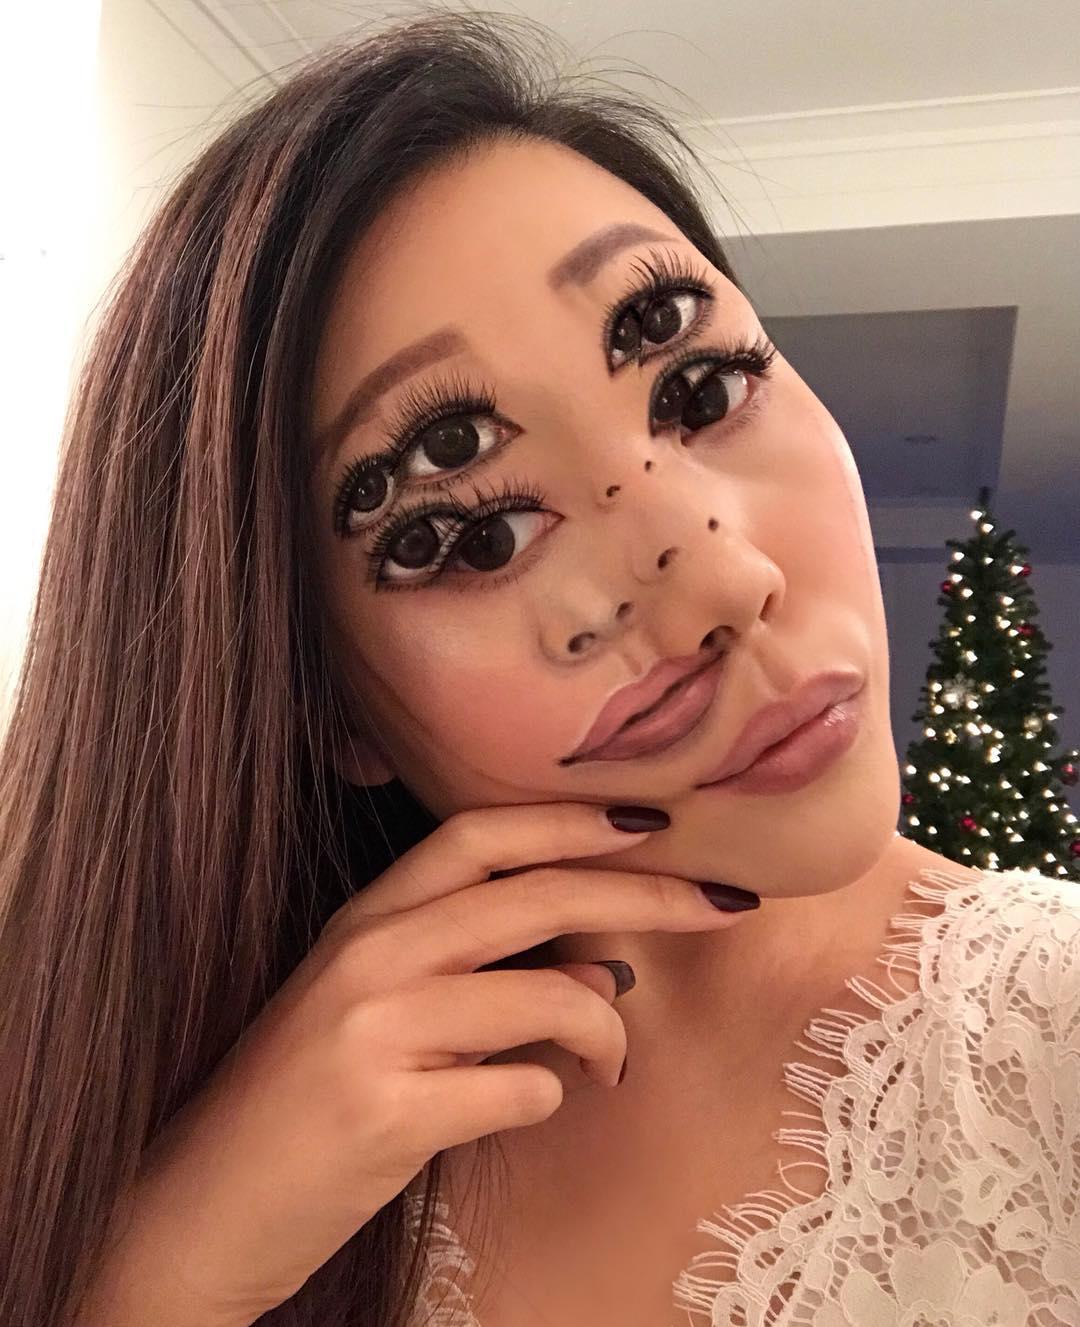 Mimi choi maquillaje ilusion optica (4)